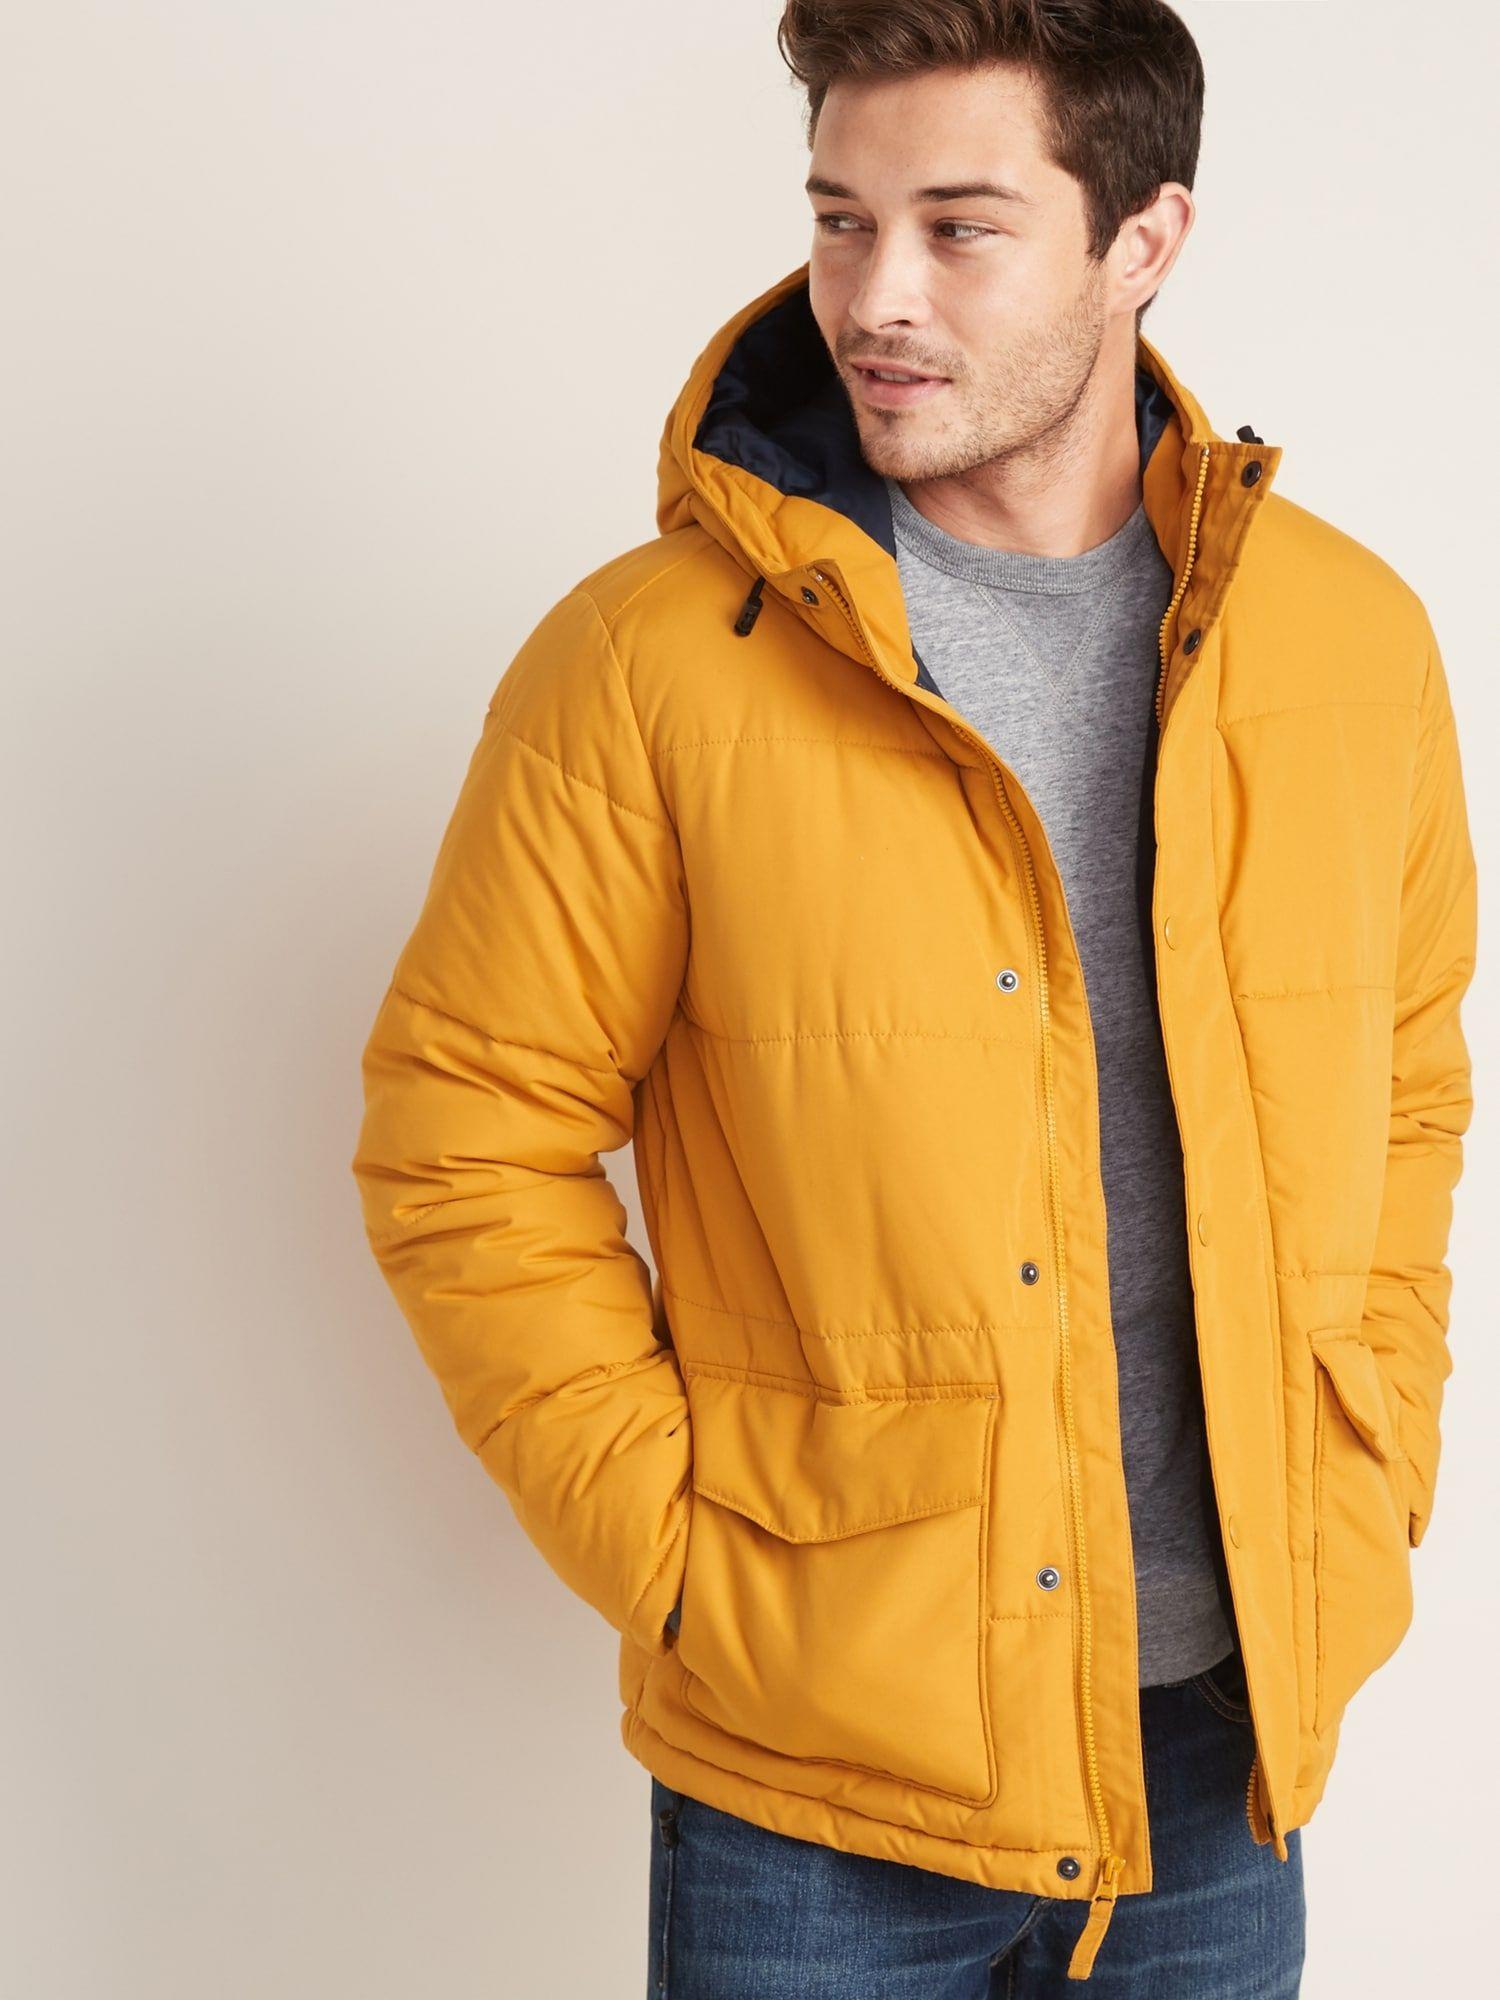 WaterResistant Hooded Puffer Jacket For Men Puffer